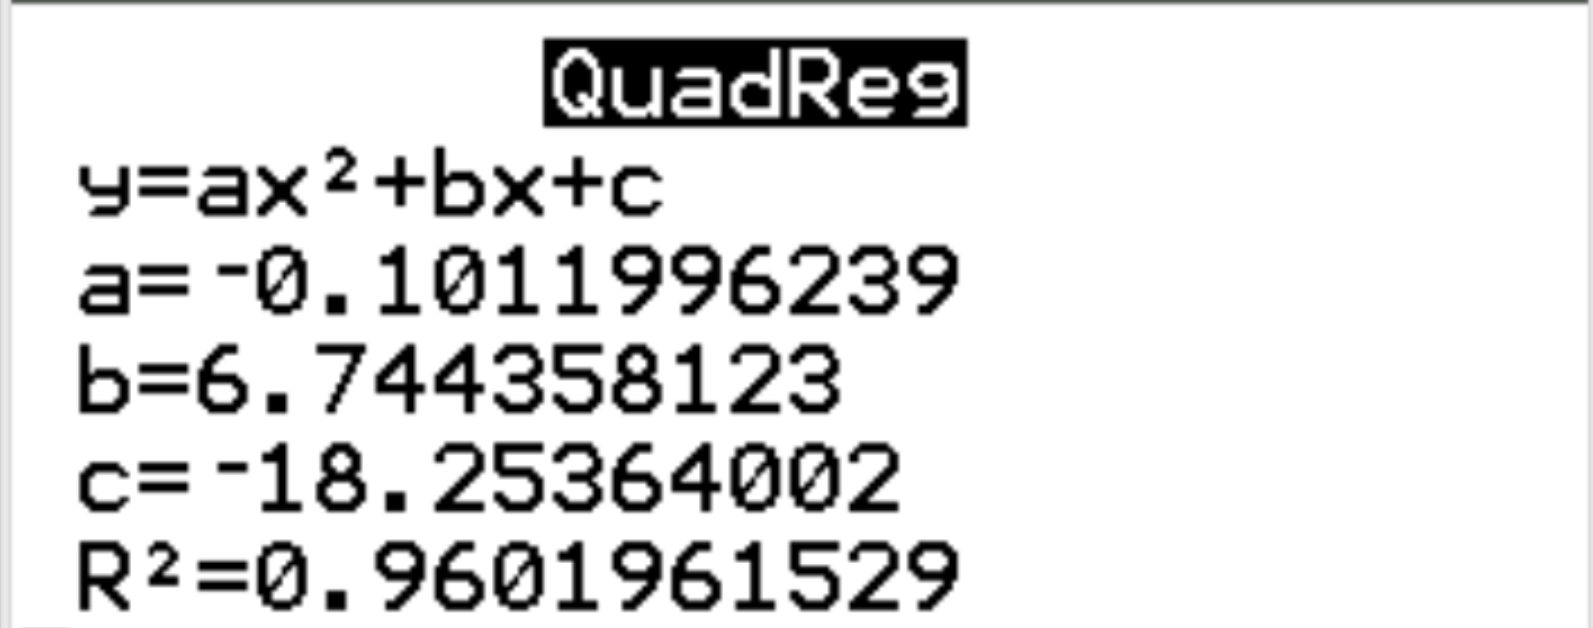 Quadratic regression output on a TI-84 calculator